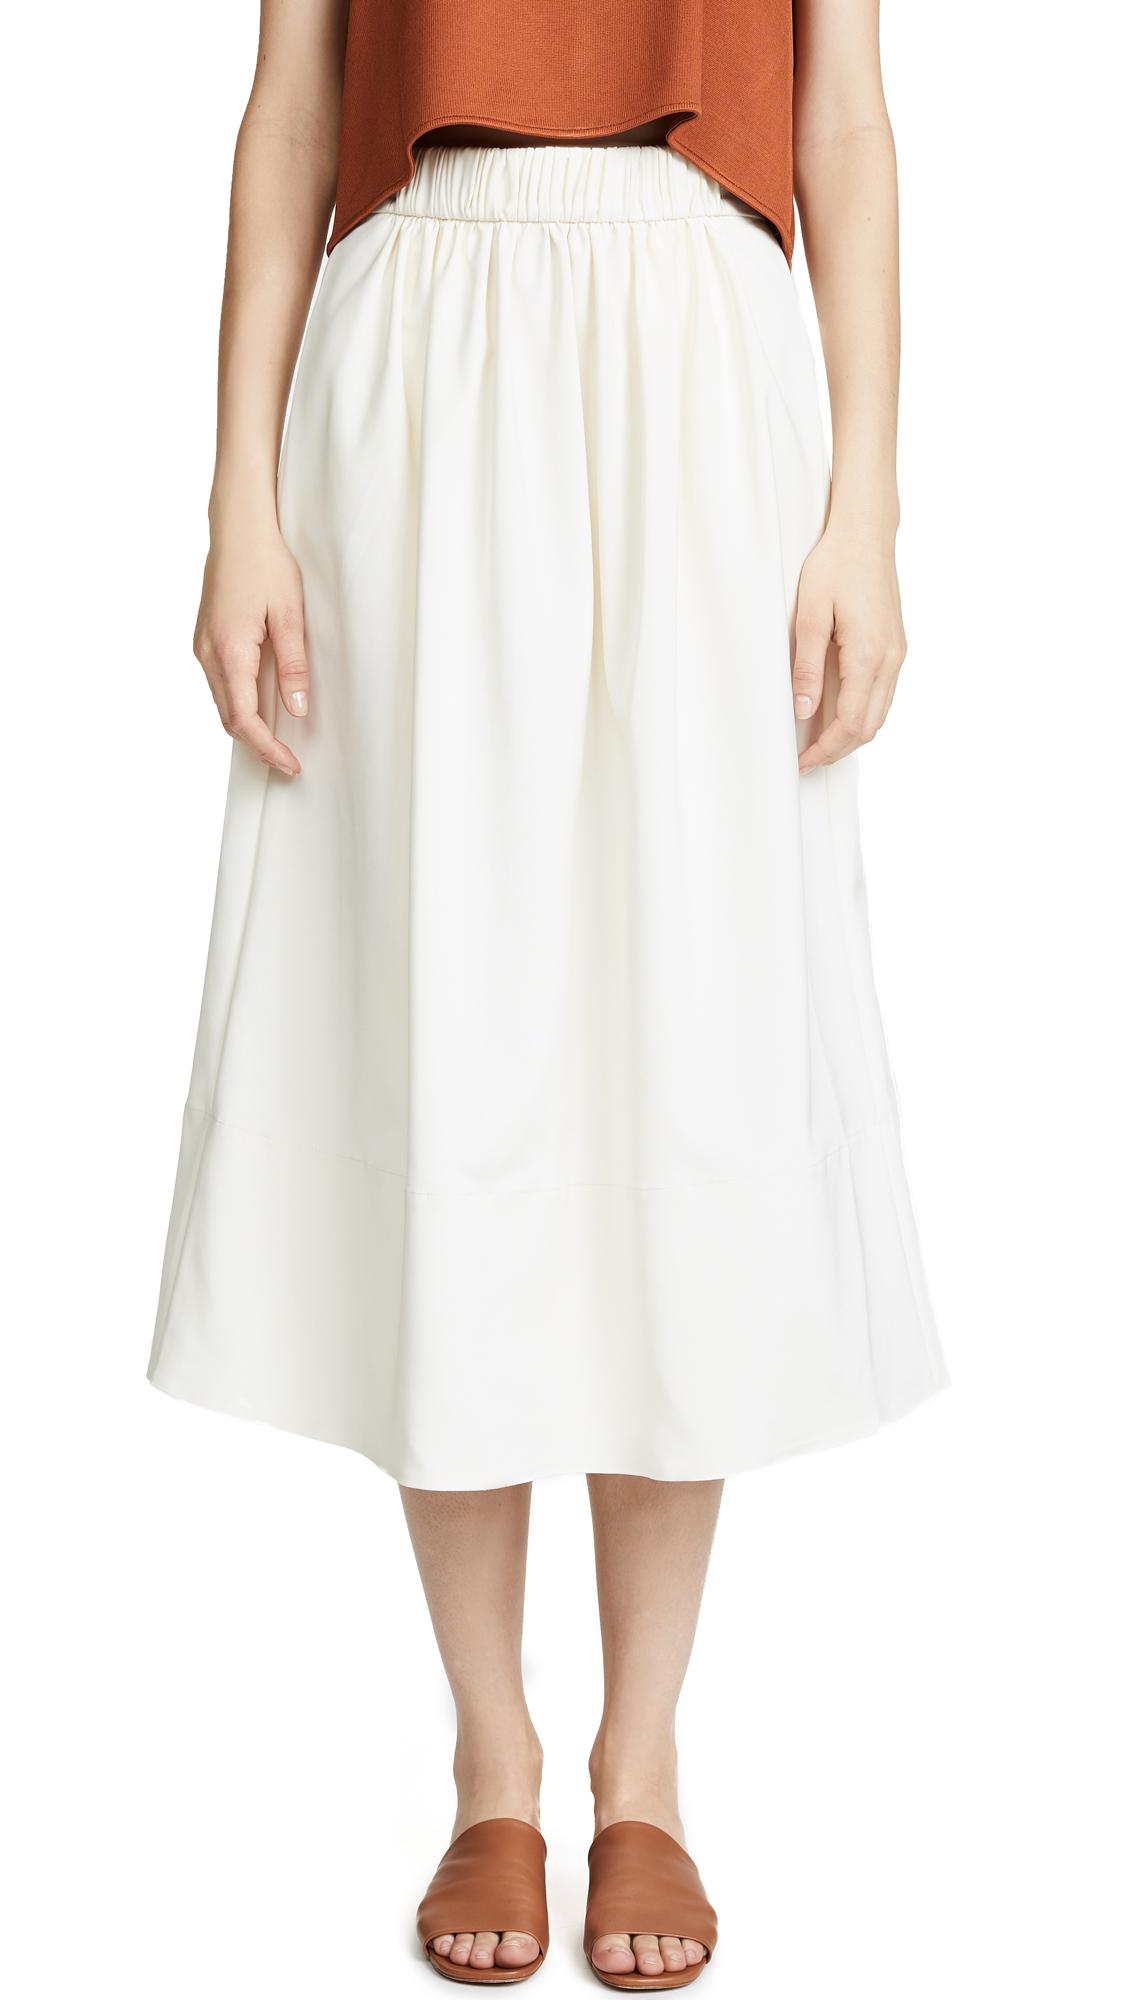 Tibi Smocked Waist Skirt - Ivory